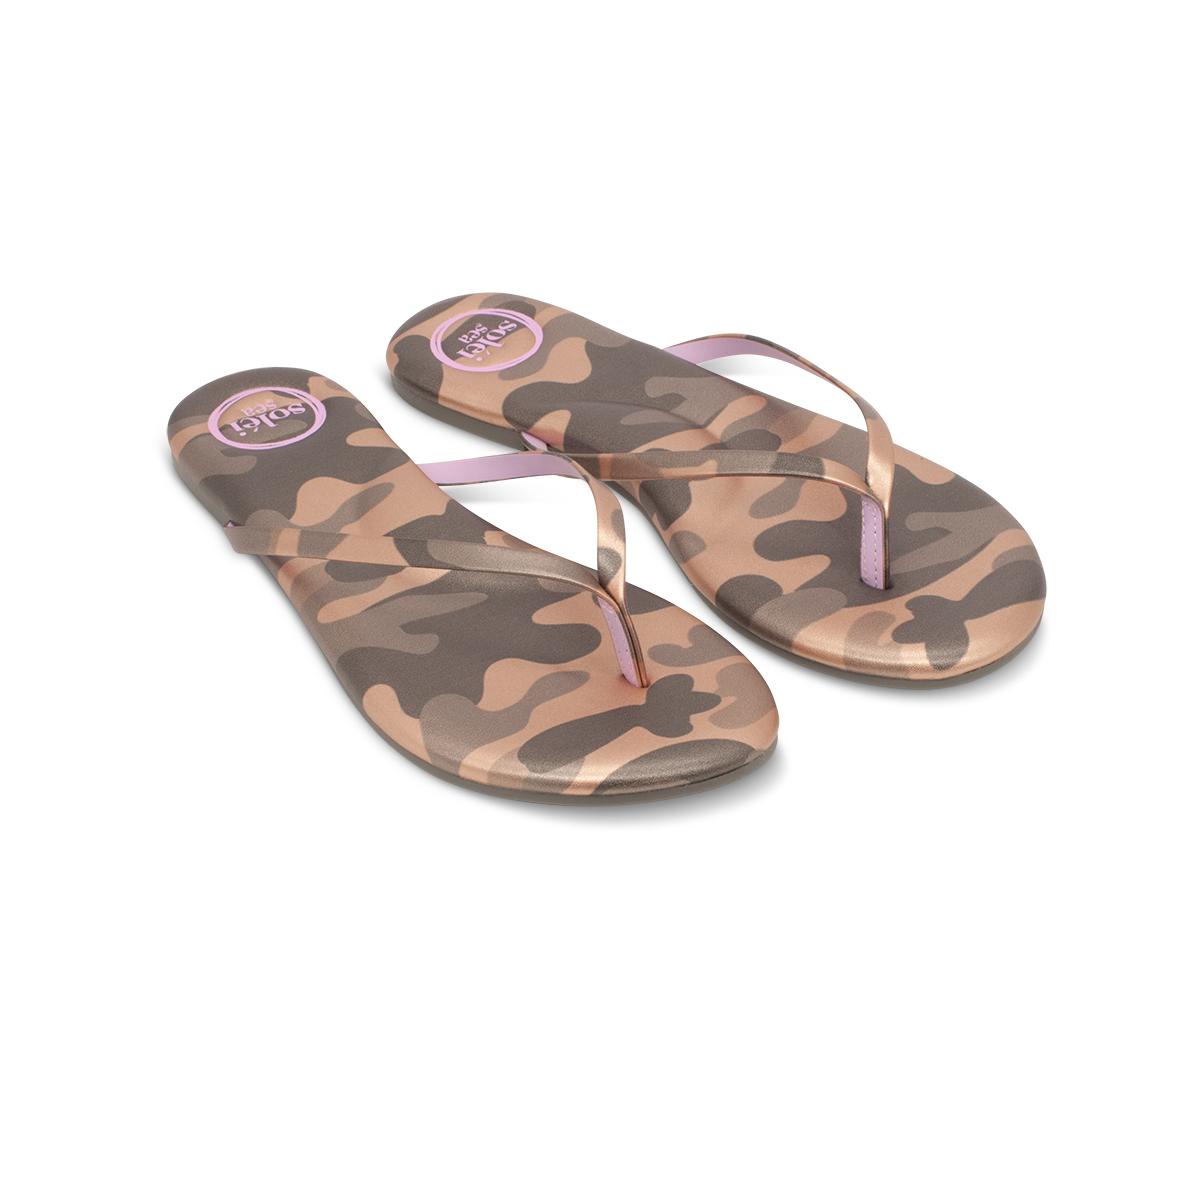 Solei Sea Solei Sea Camo Metallic Gold & Lilac Flip Flop